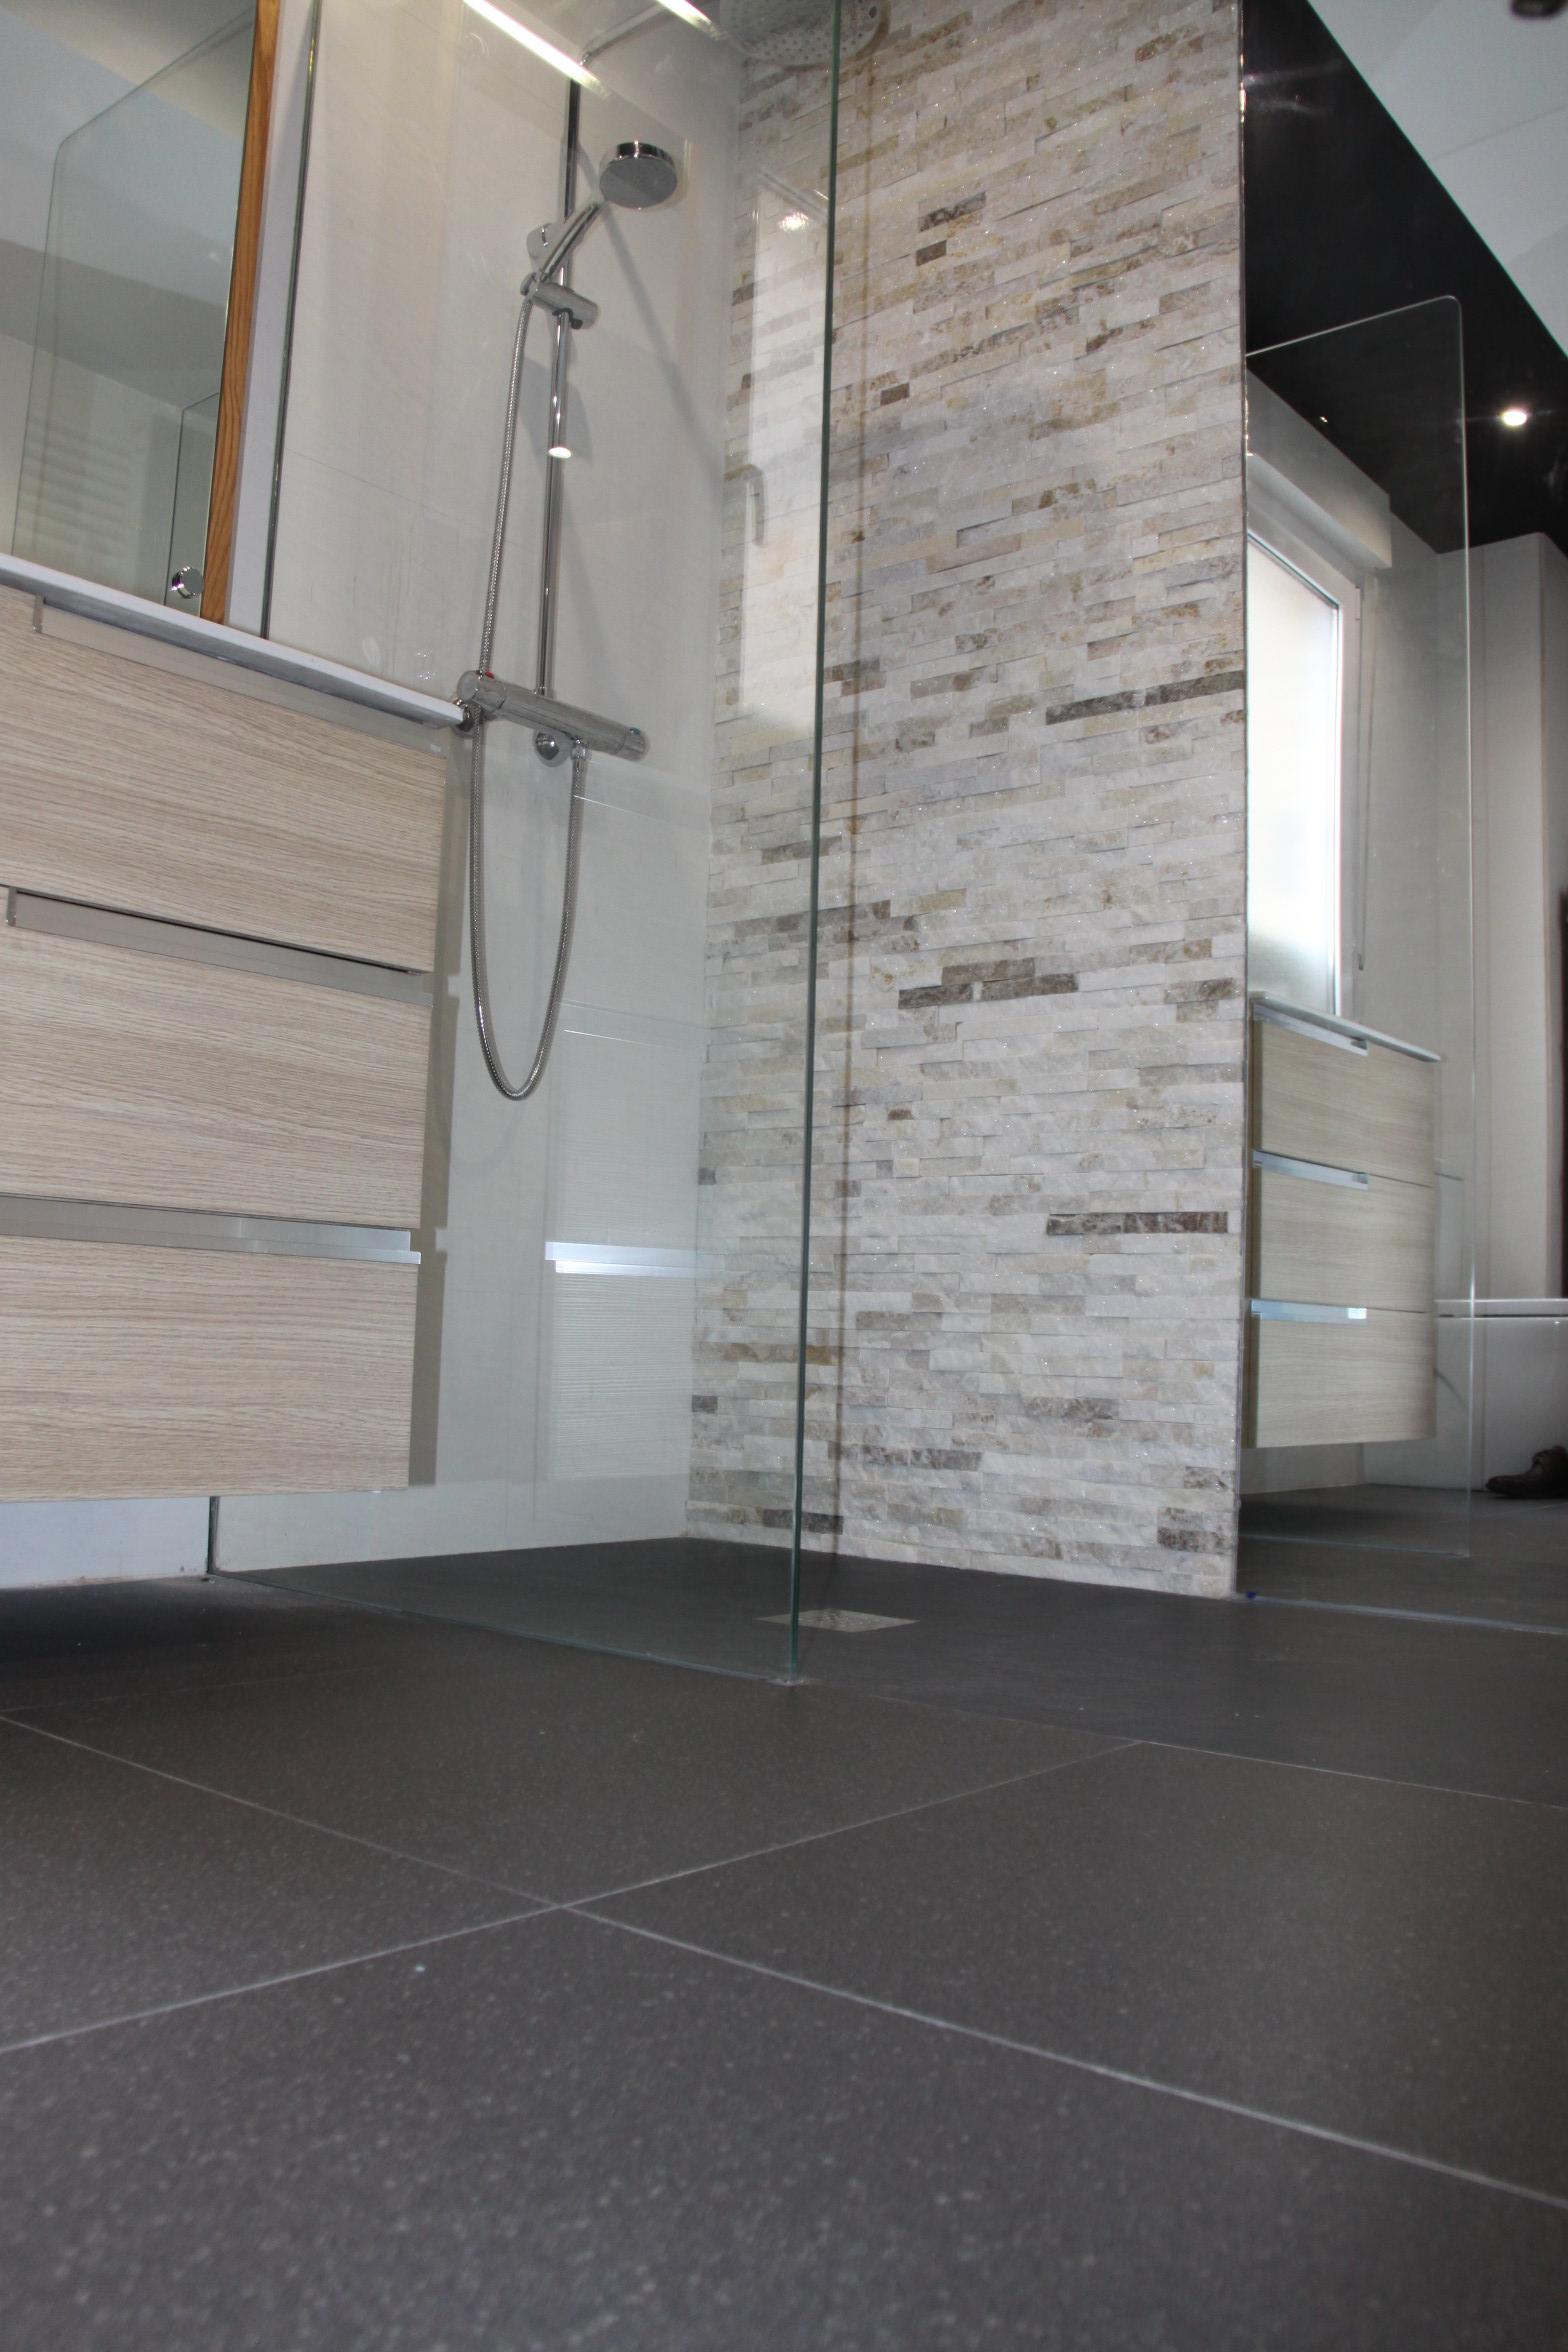 Plato de ducha atelier32 for Aseos pequenos con ducha